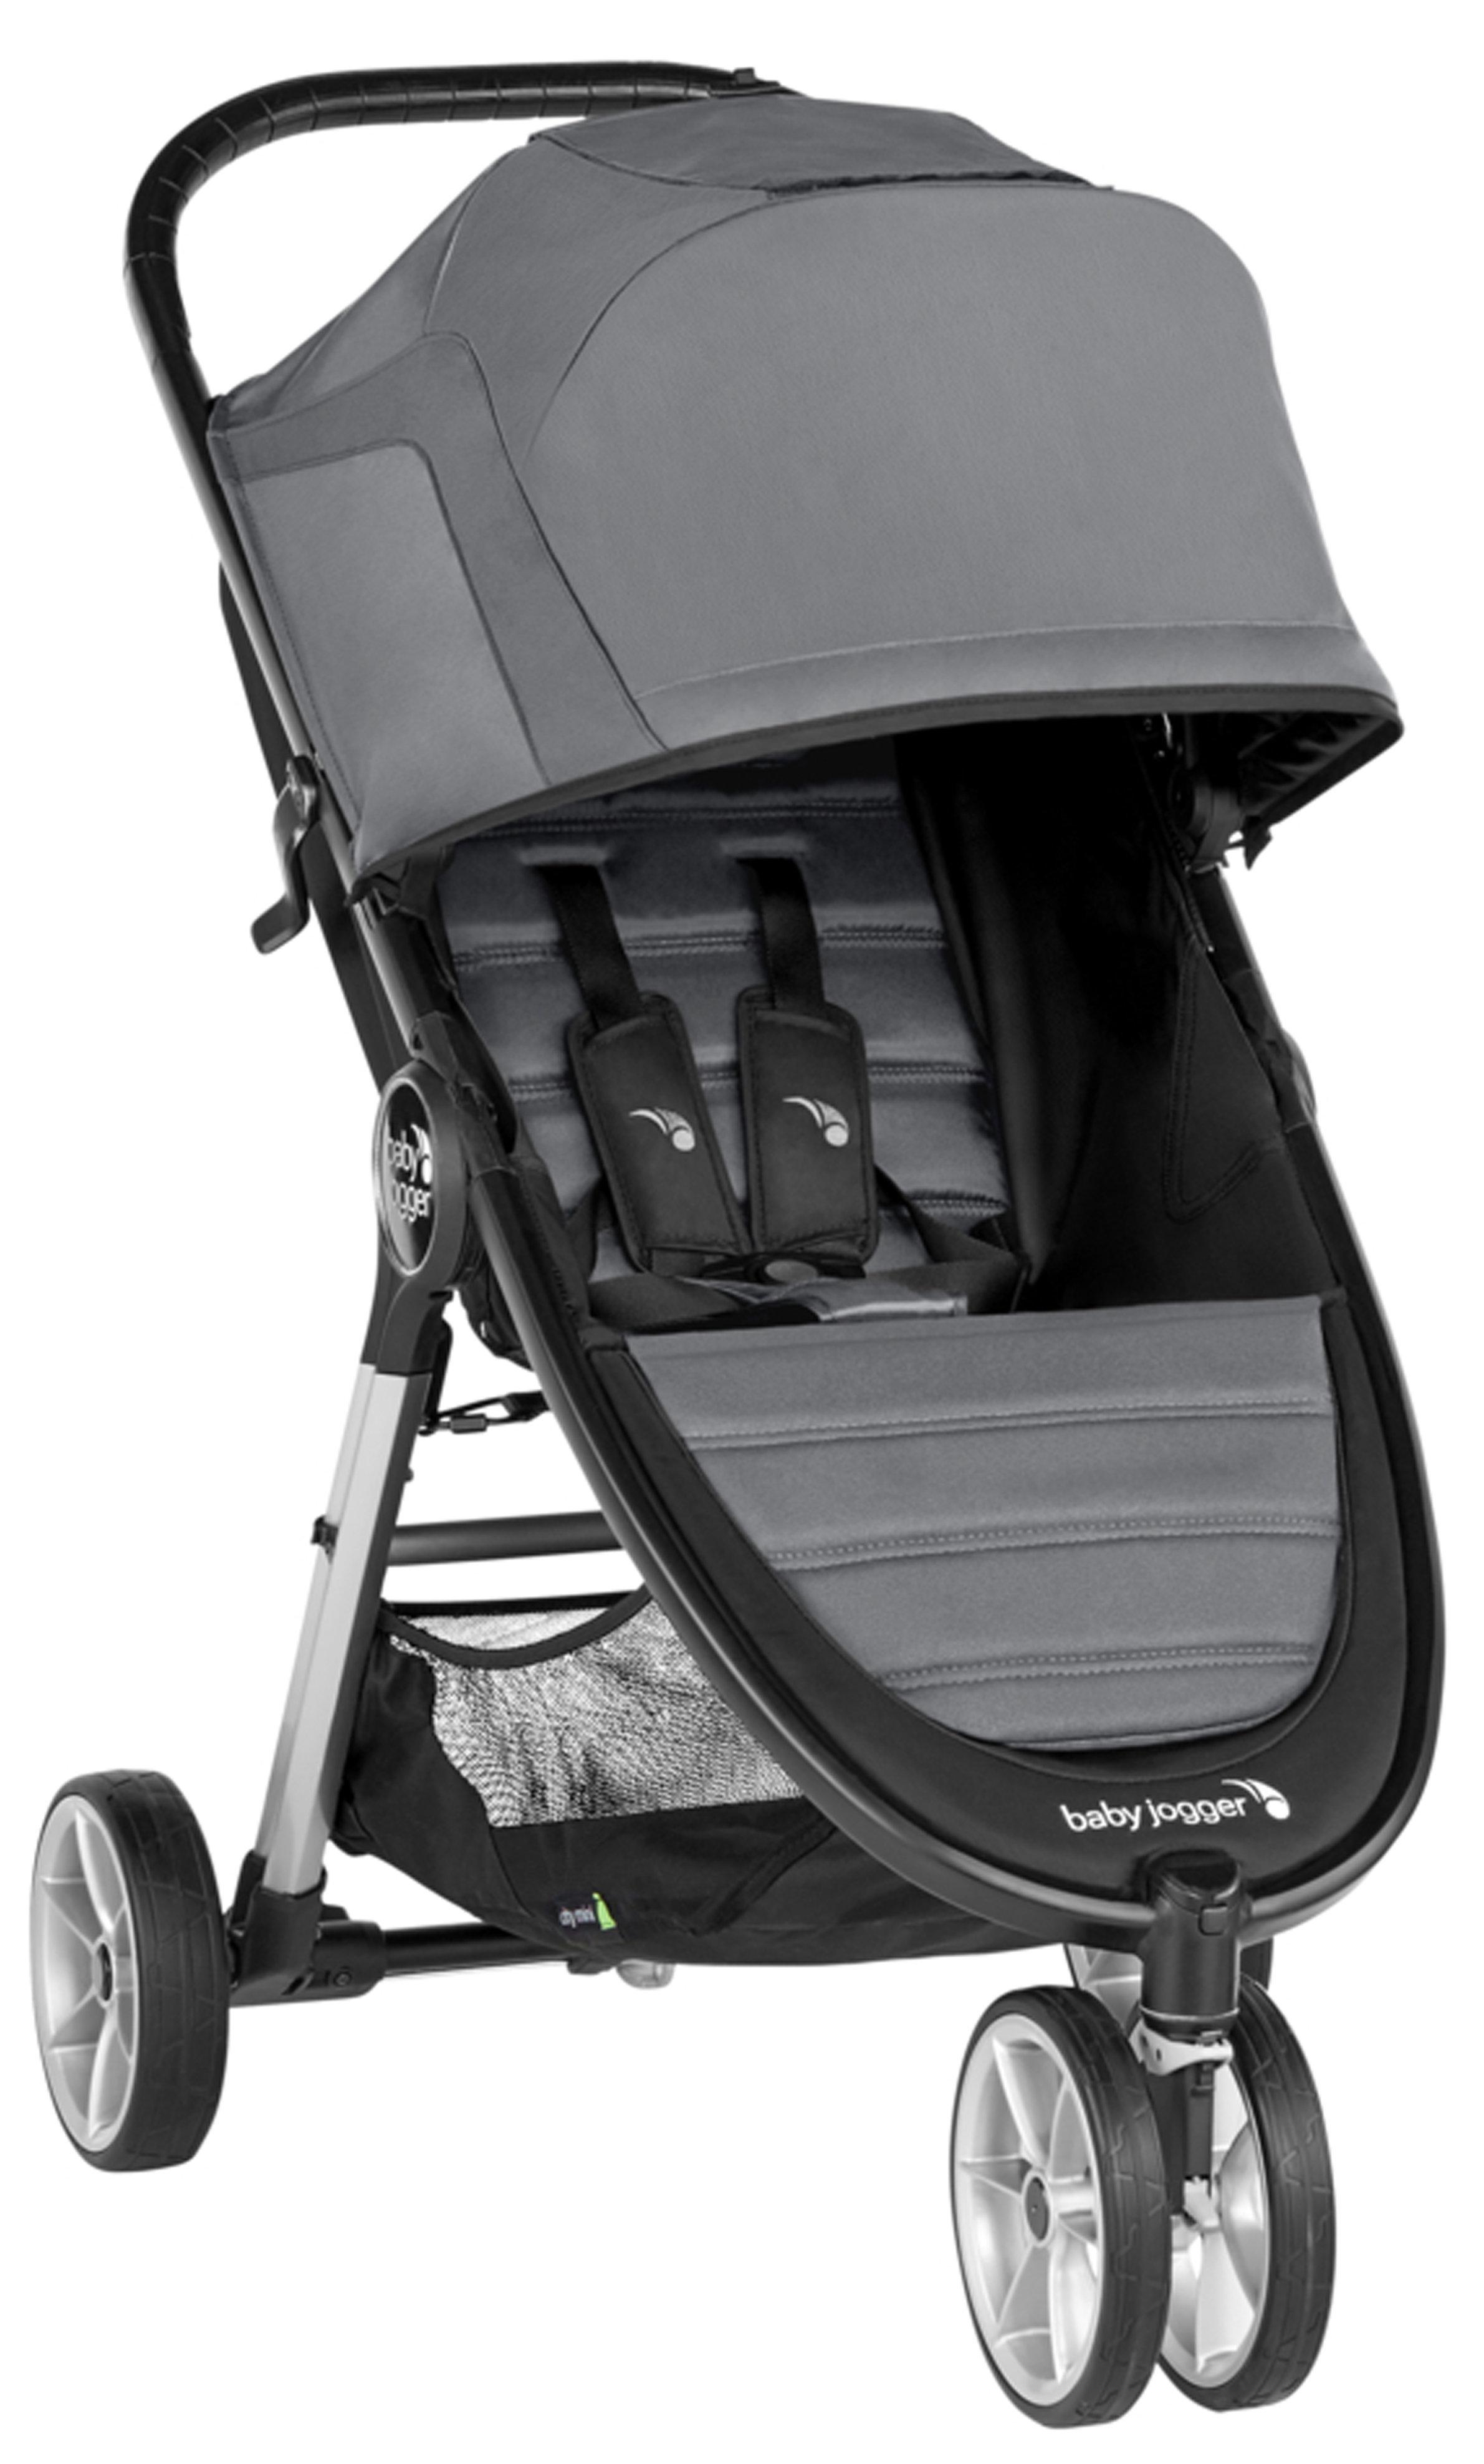 Baby Jogger City Mini 2 Travel System Pushchairsandcarseat